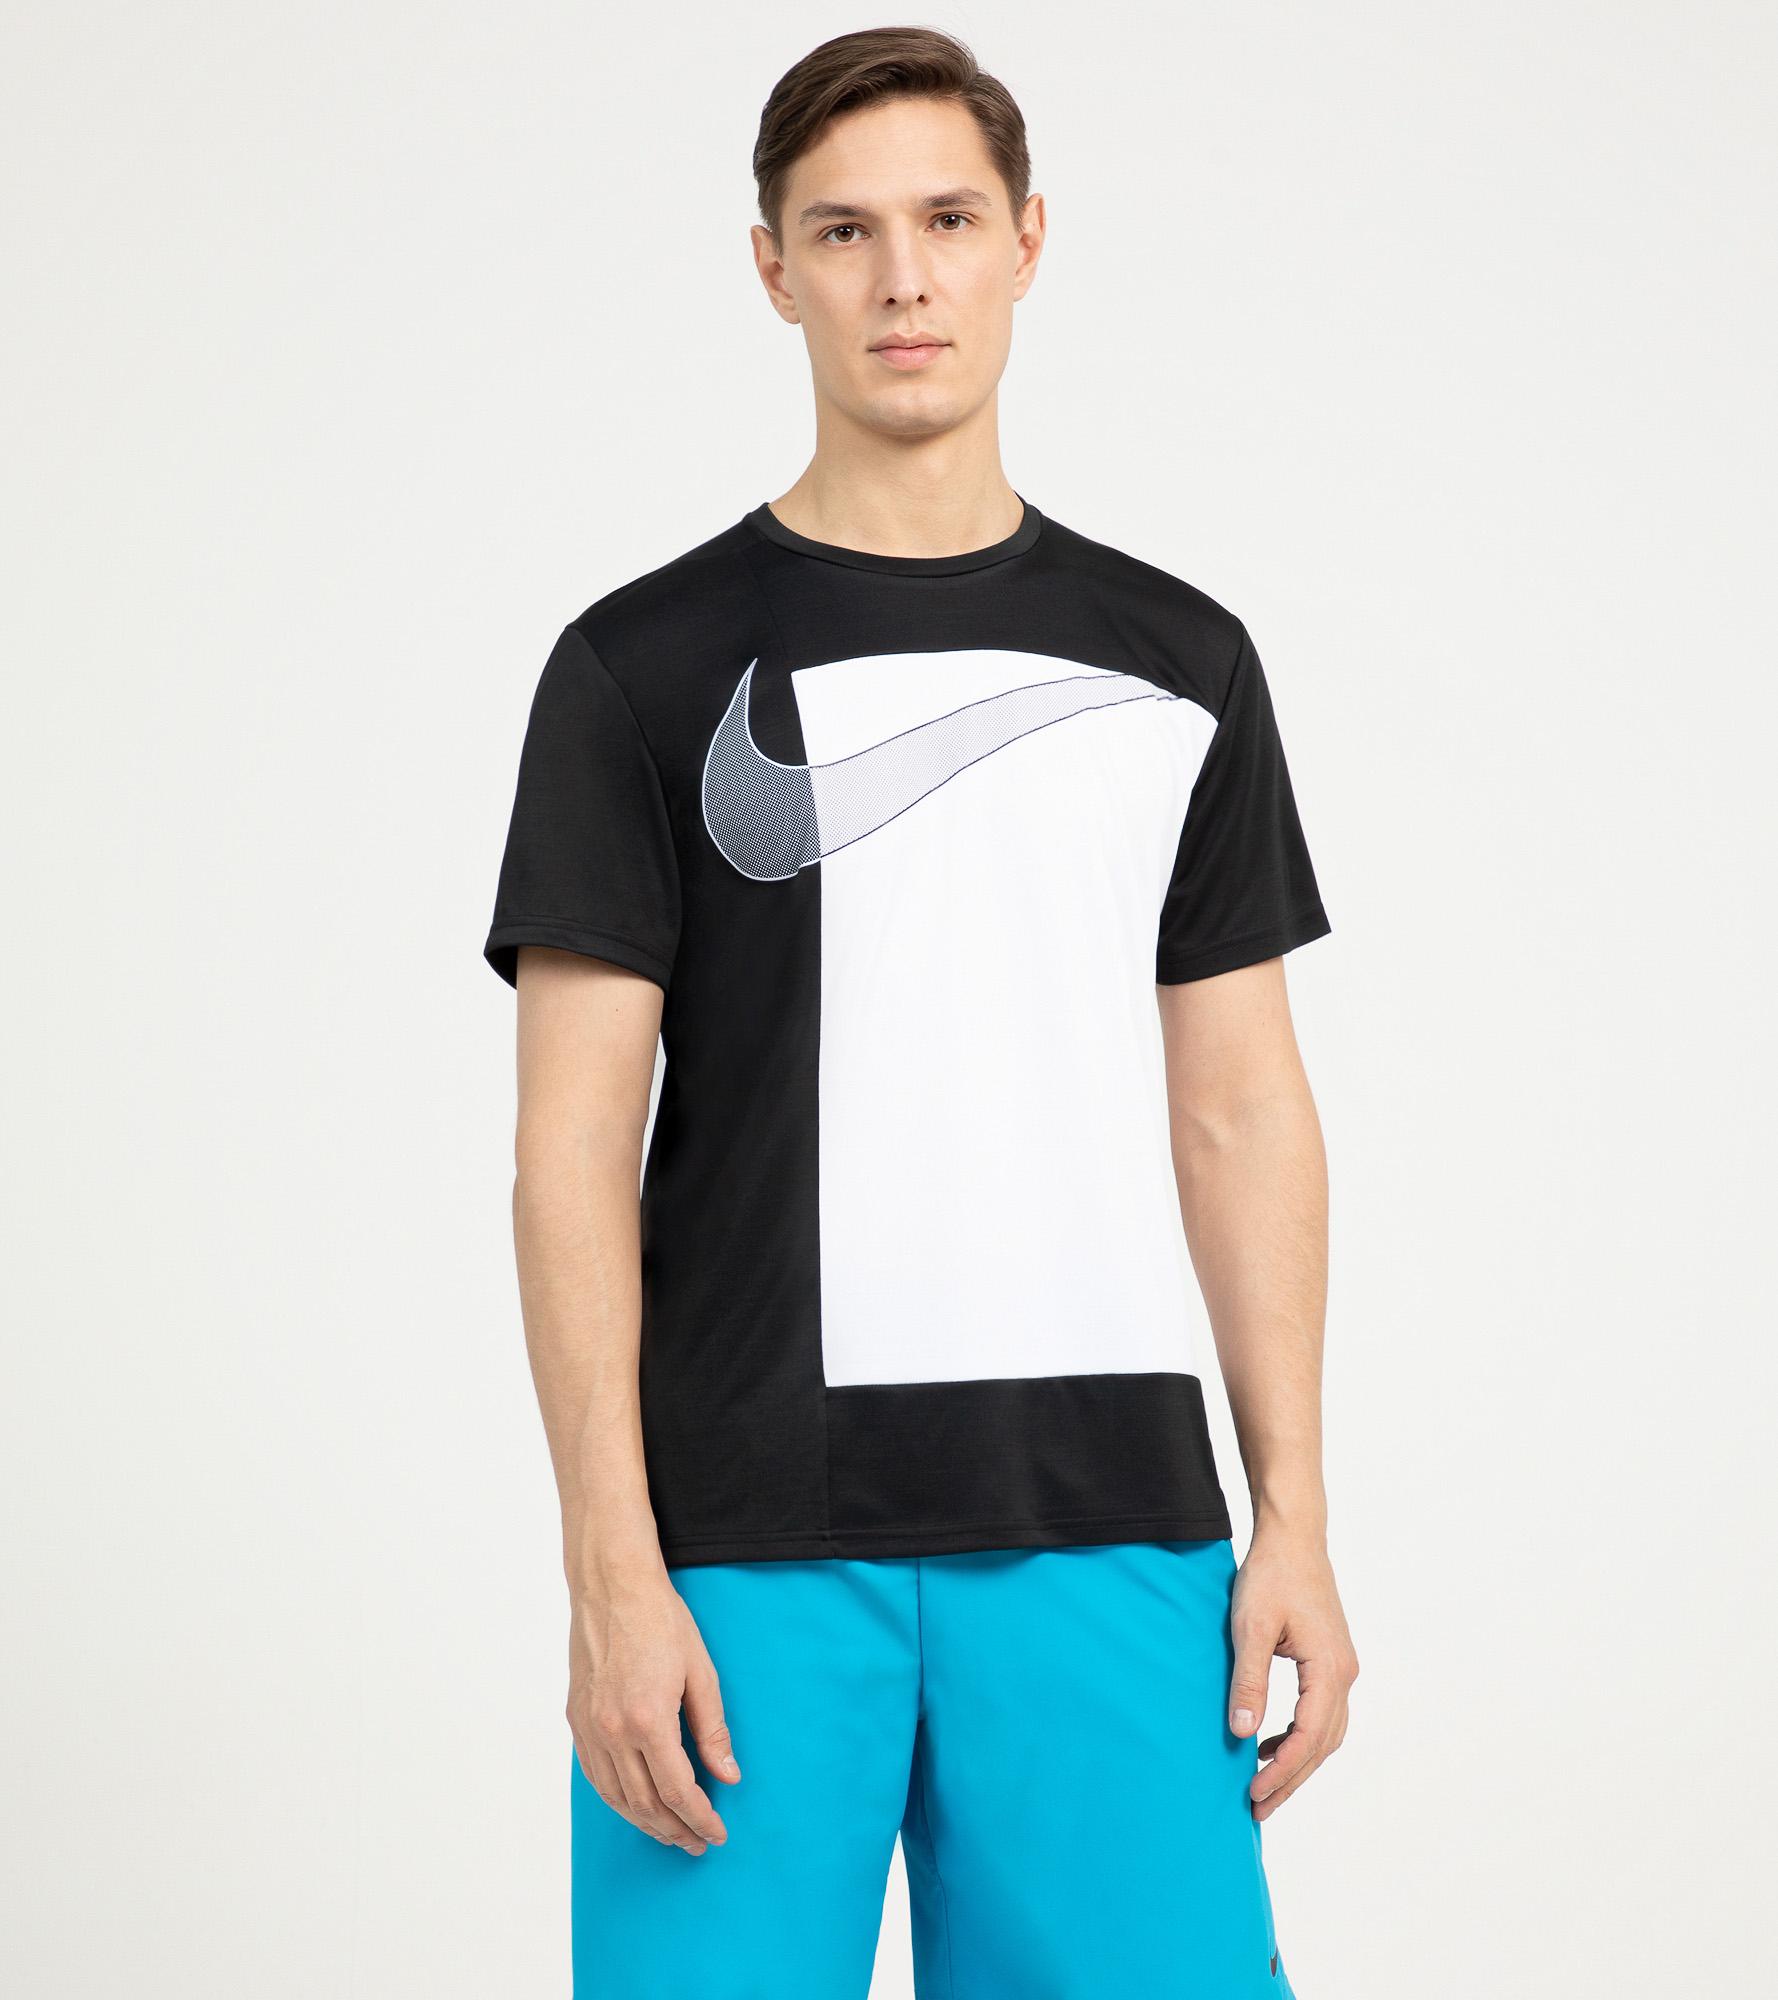 Nike Футболка мужская Superset, размер 52-54